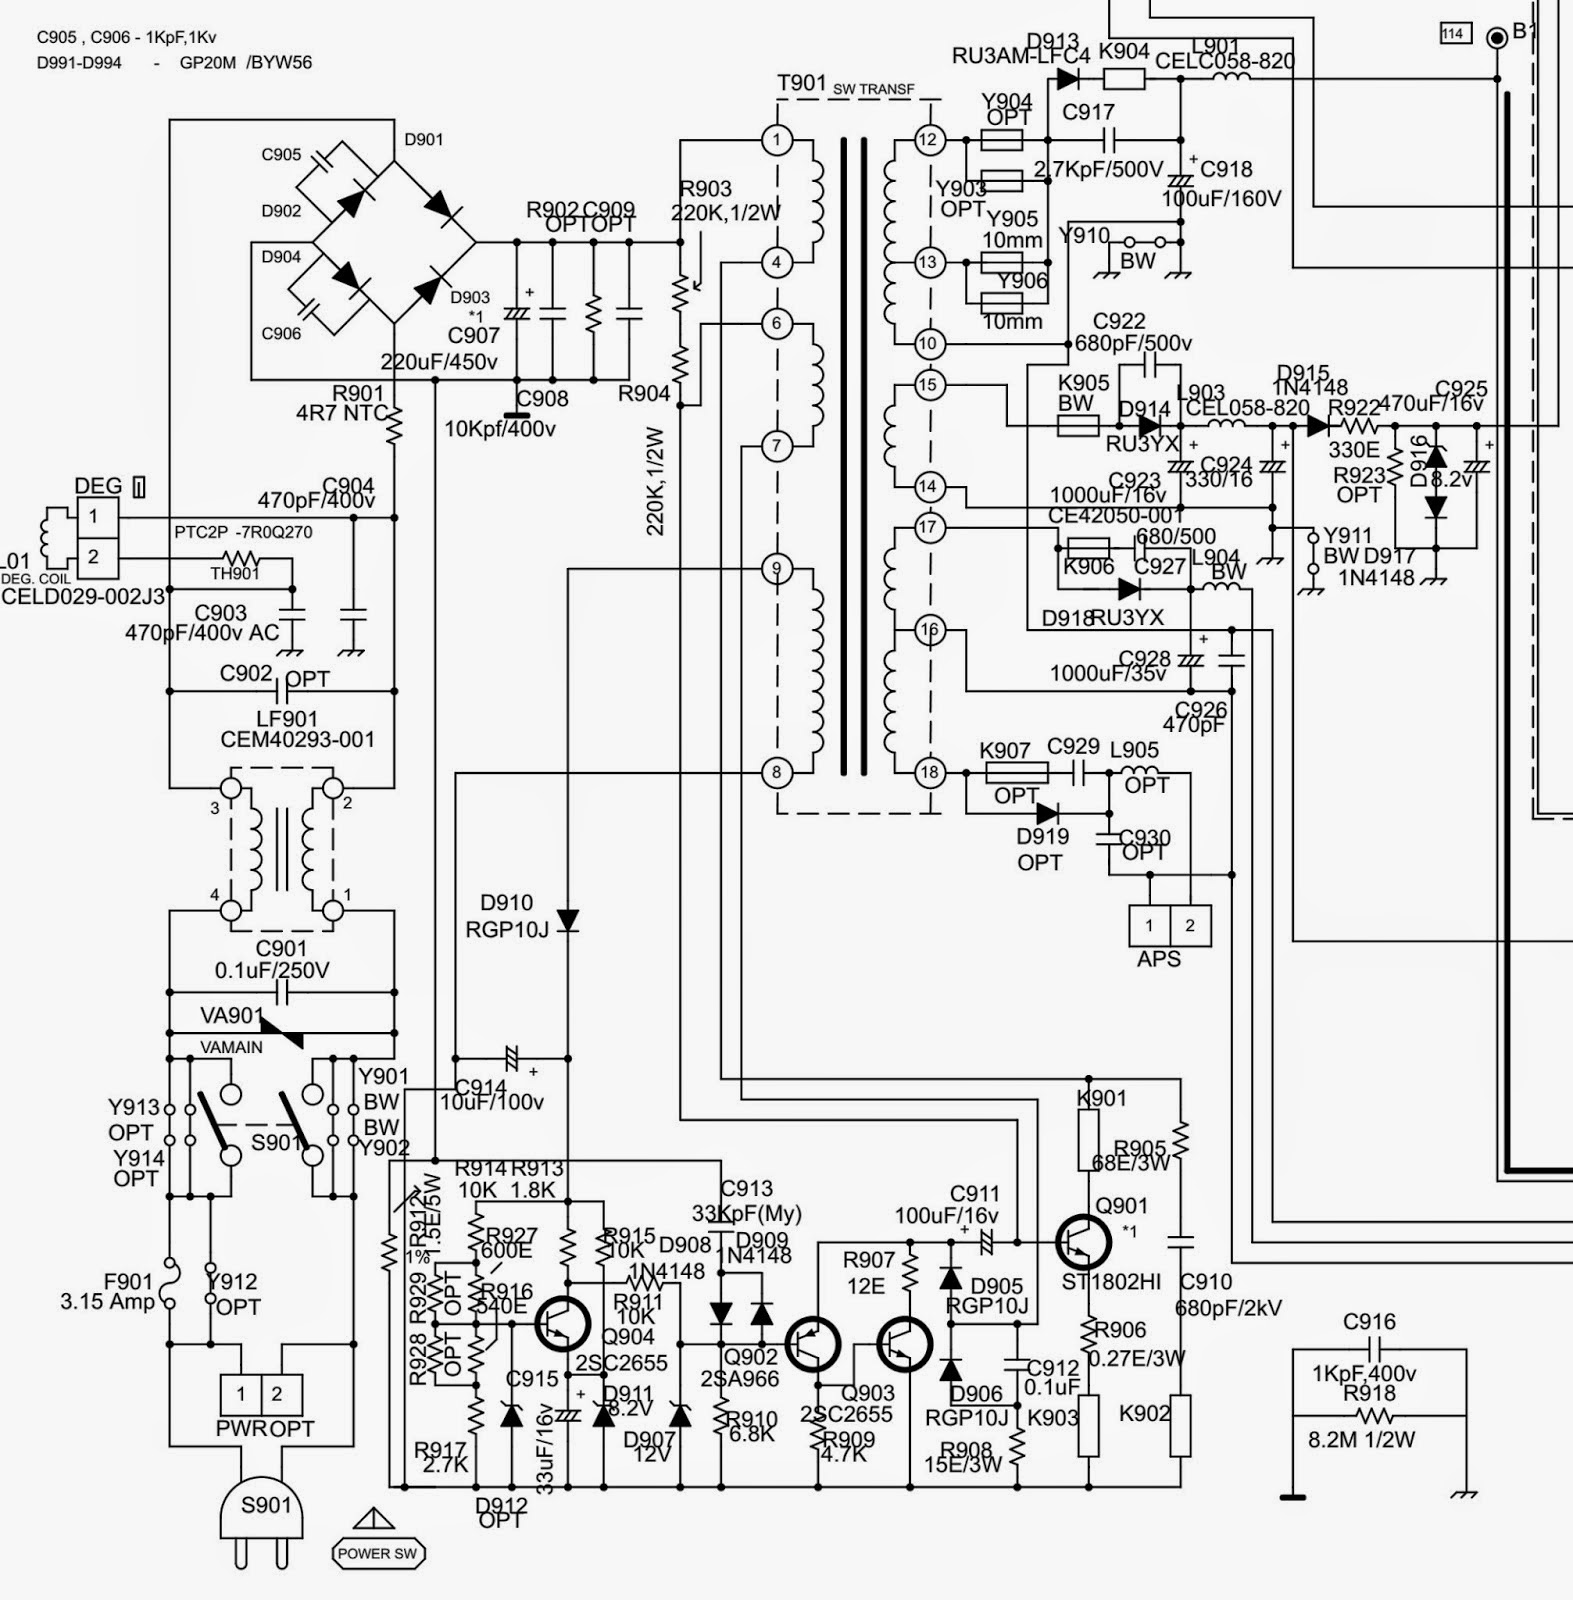 medium resolution of b w tv circuit diagram wiring library rh 92 dirtytalk camgirls de led tv inverter board circuit